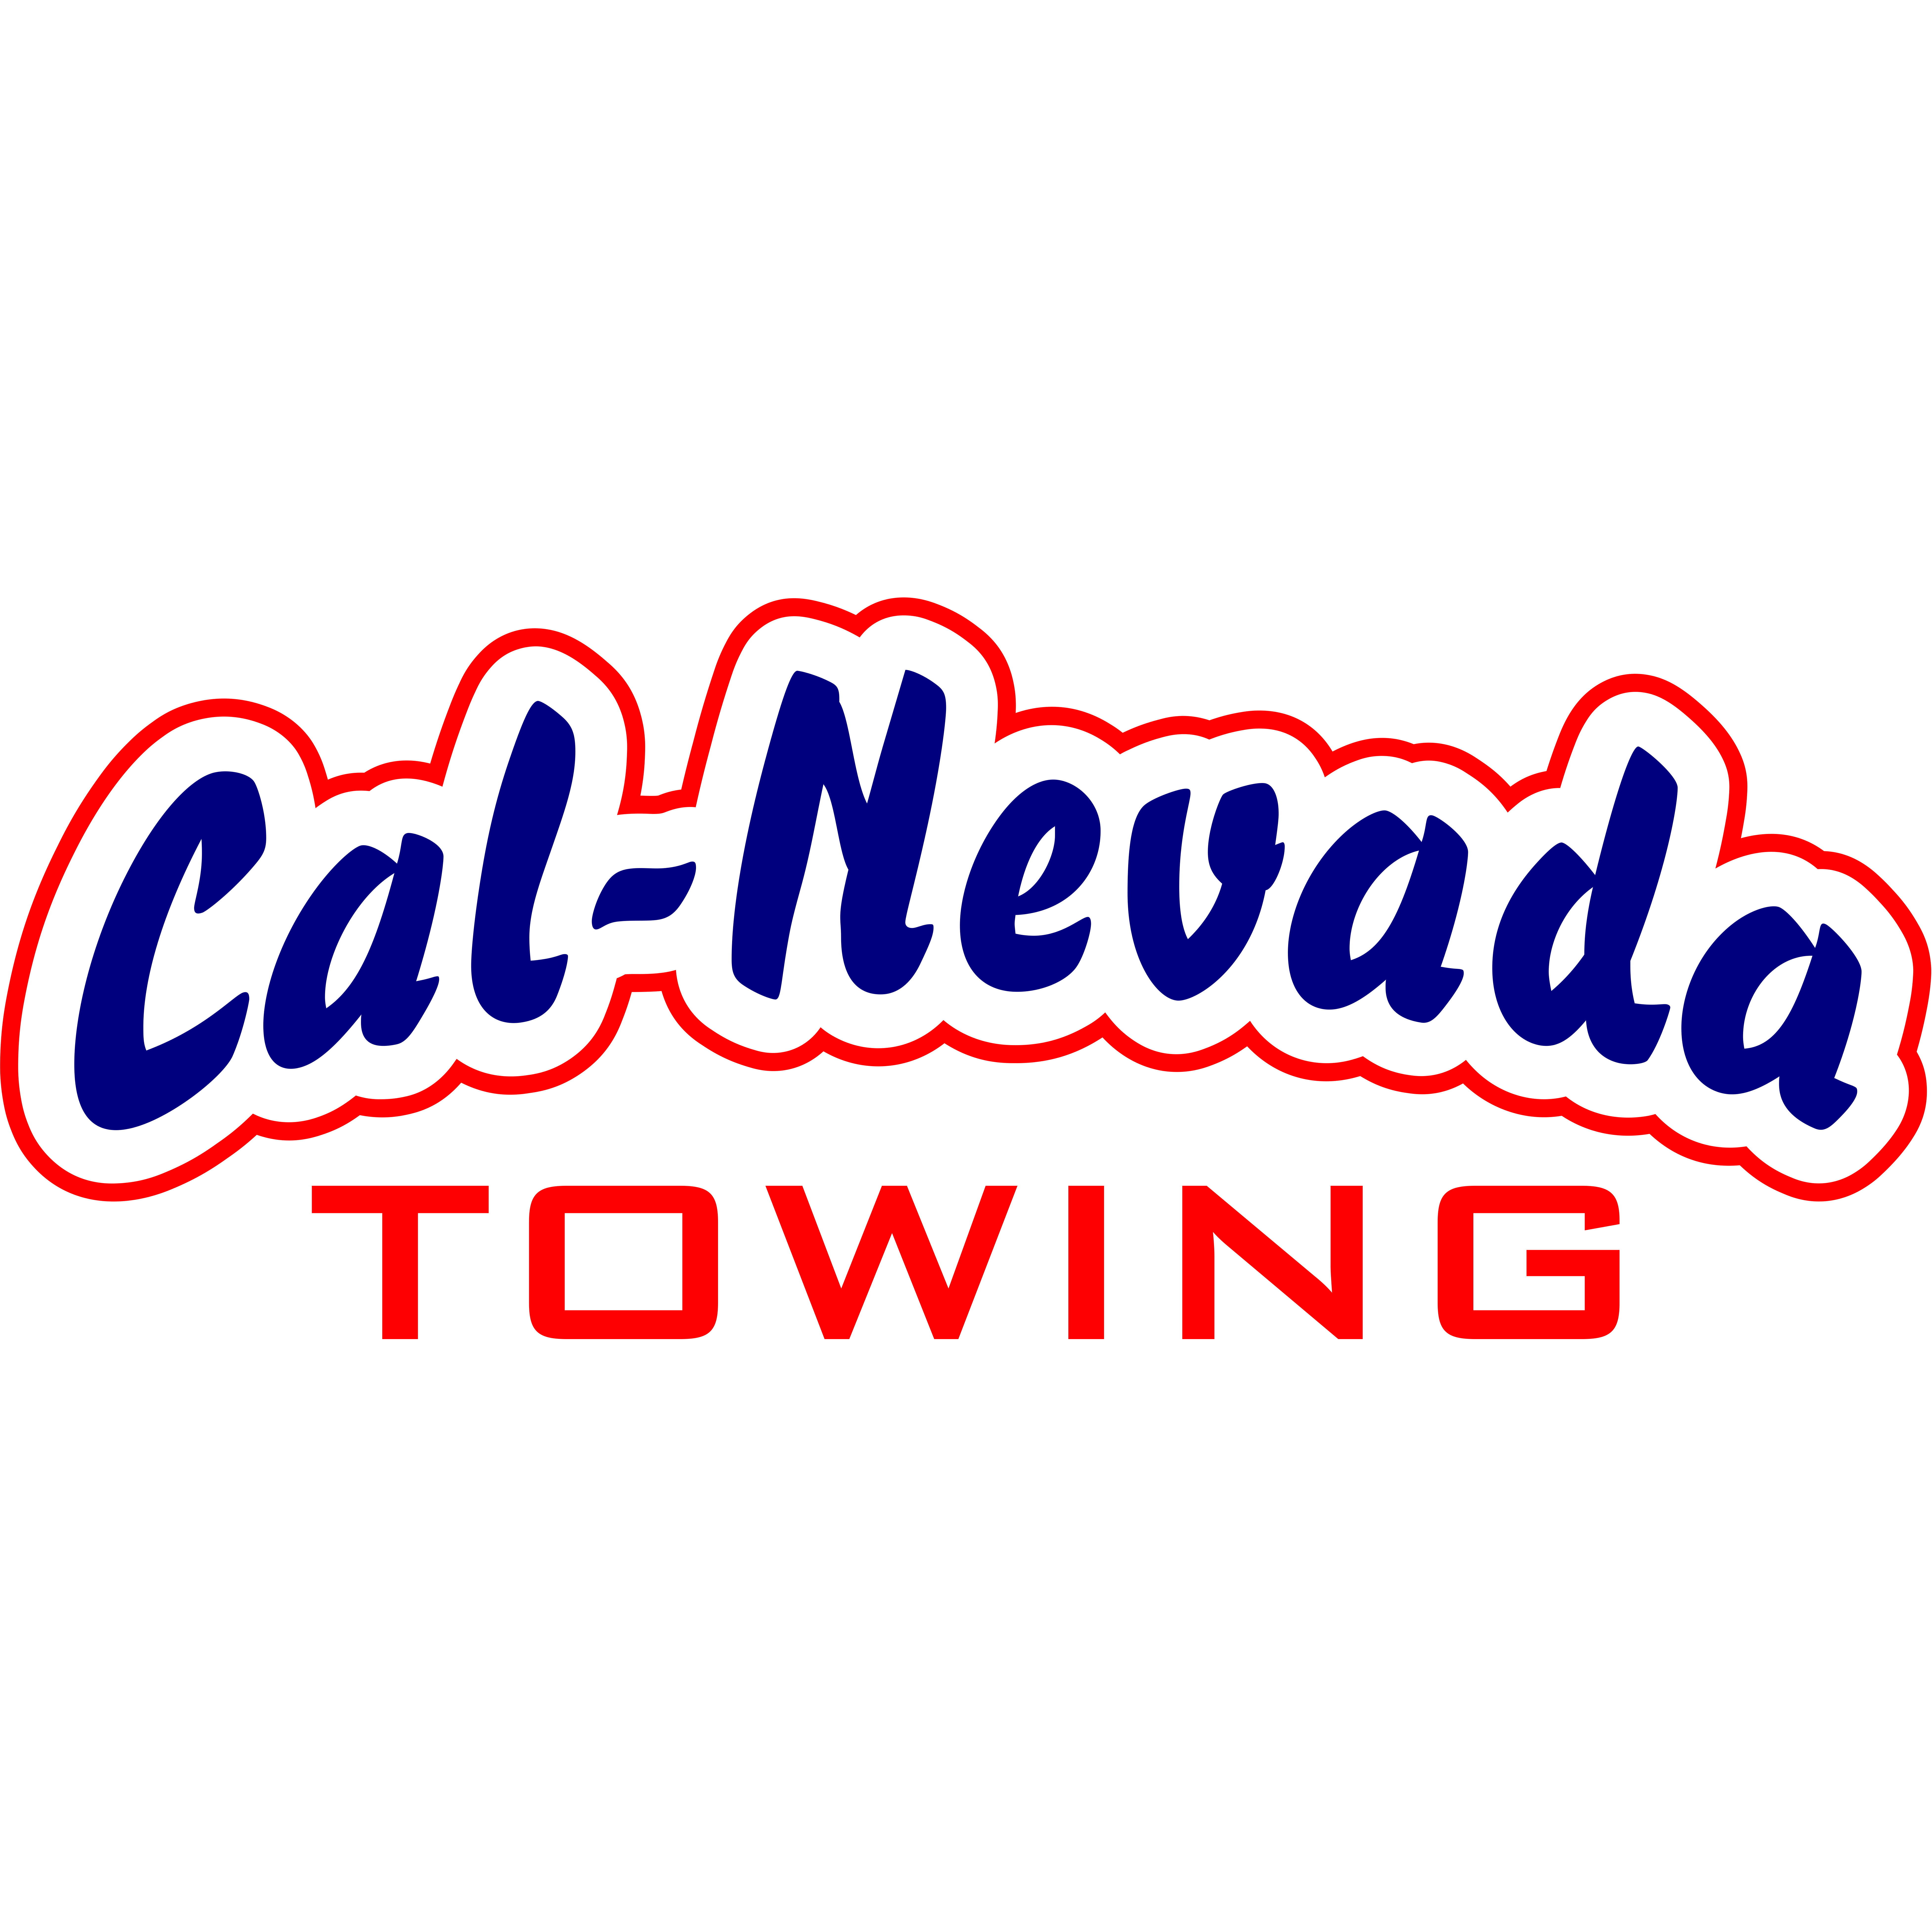 Cal Nevada Towing